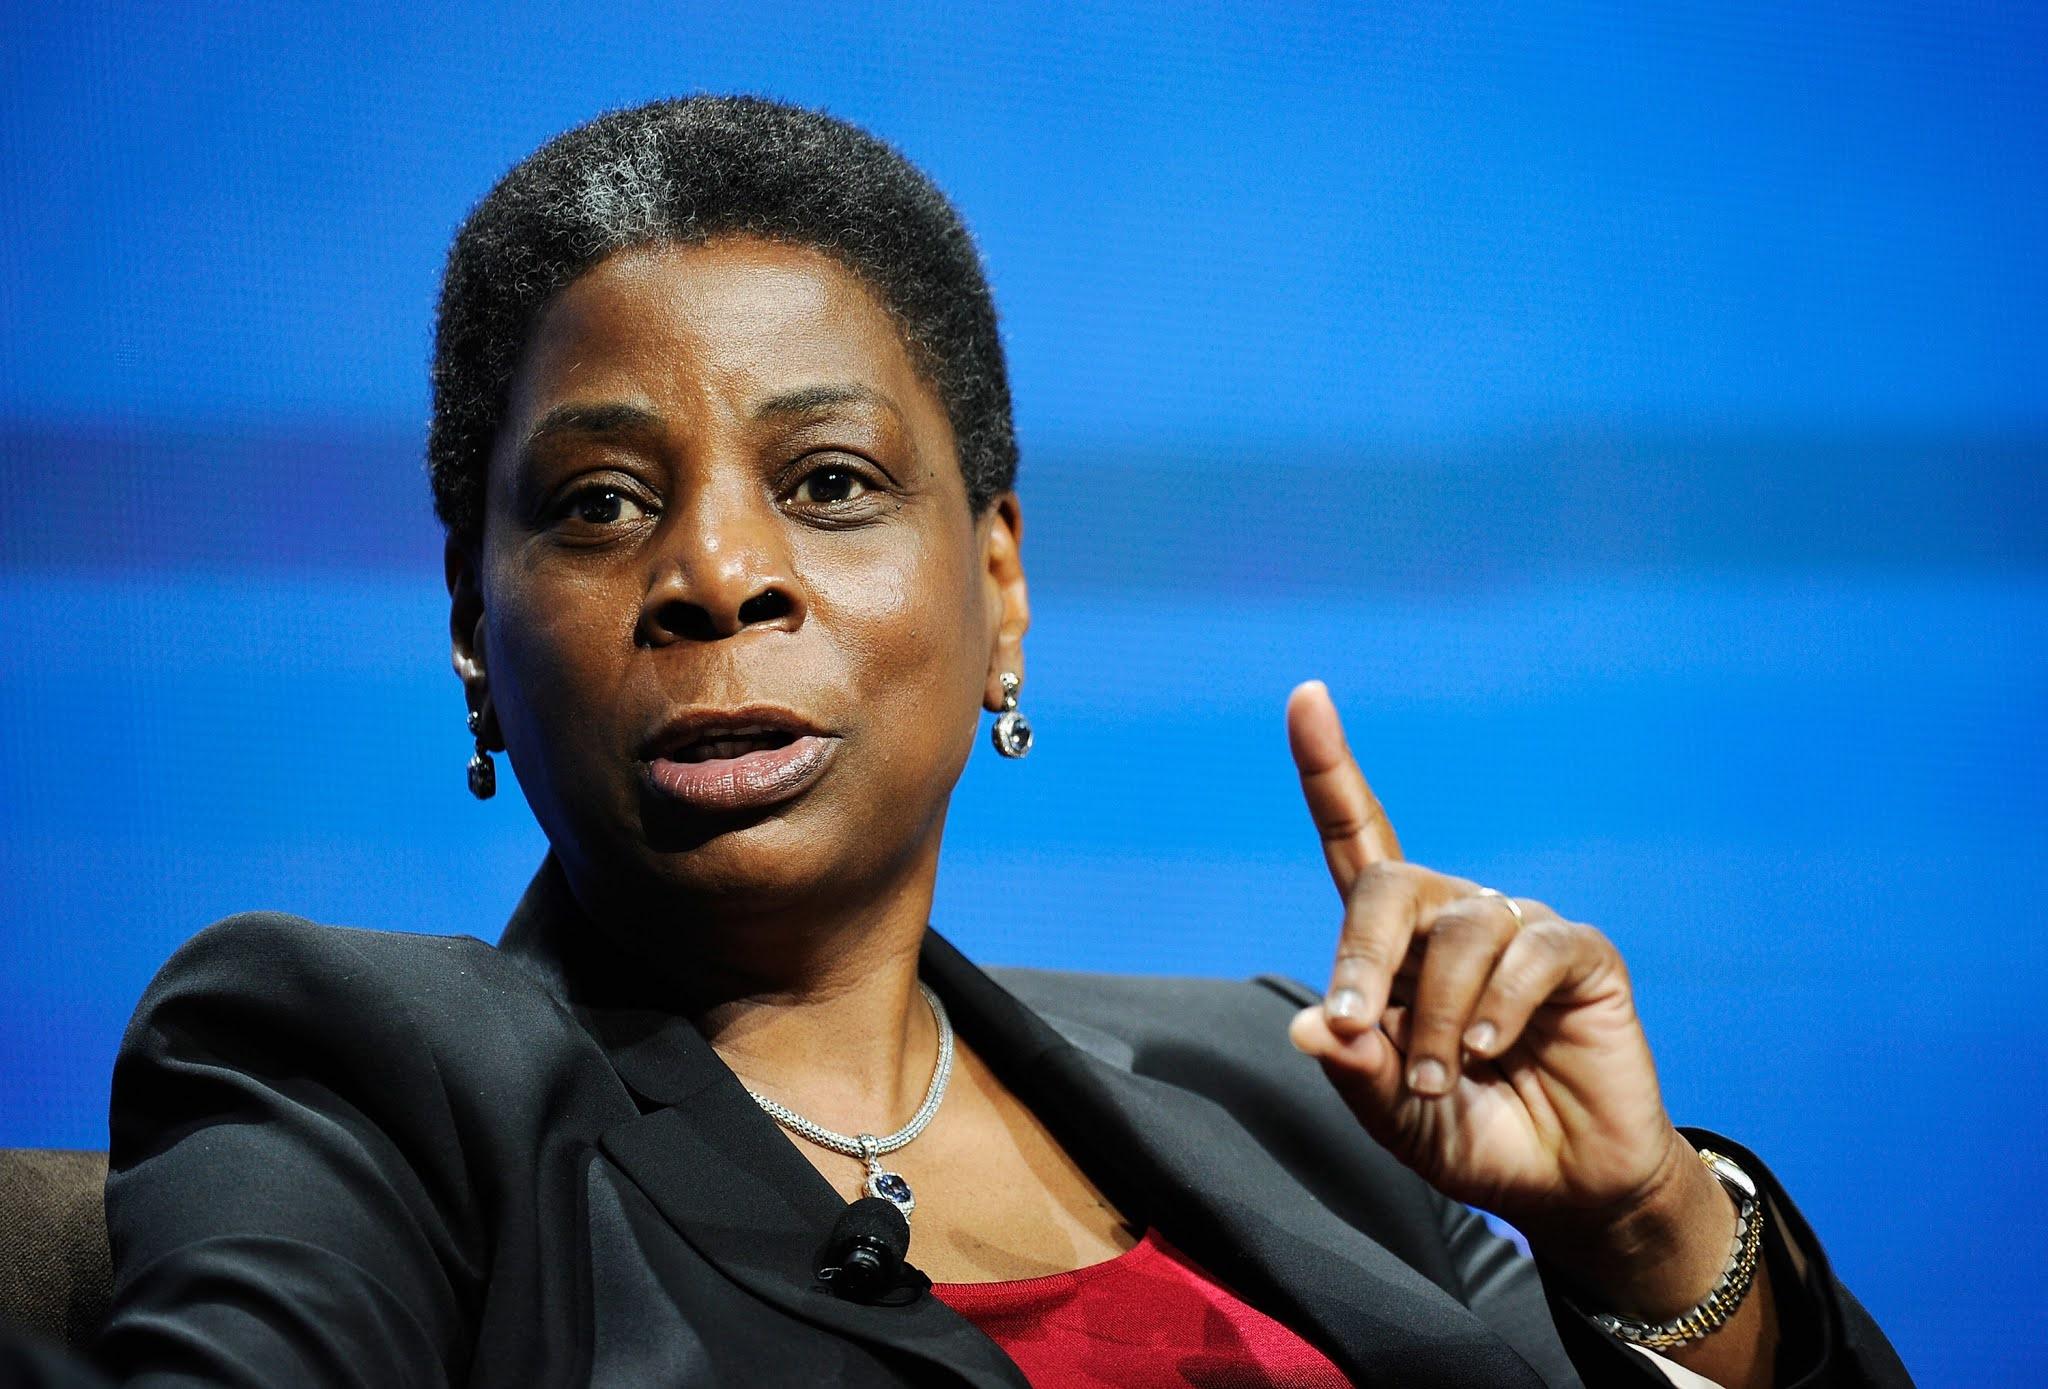 Where Are All the Black Women CEOs?